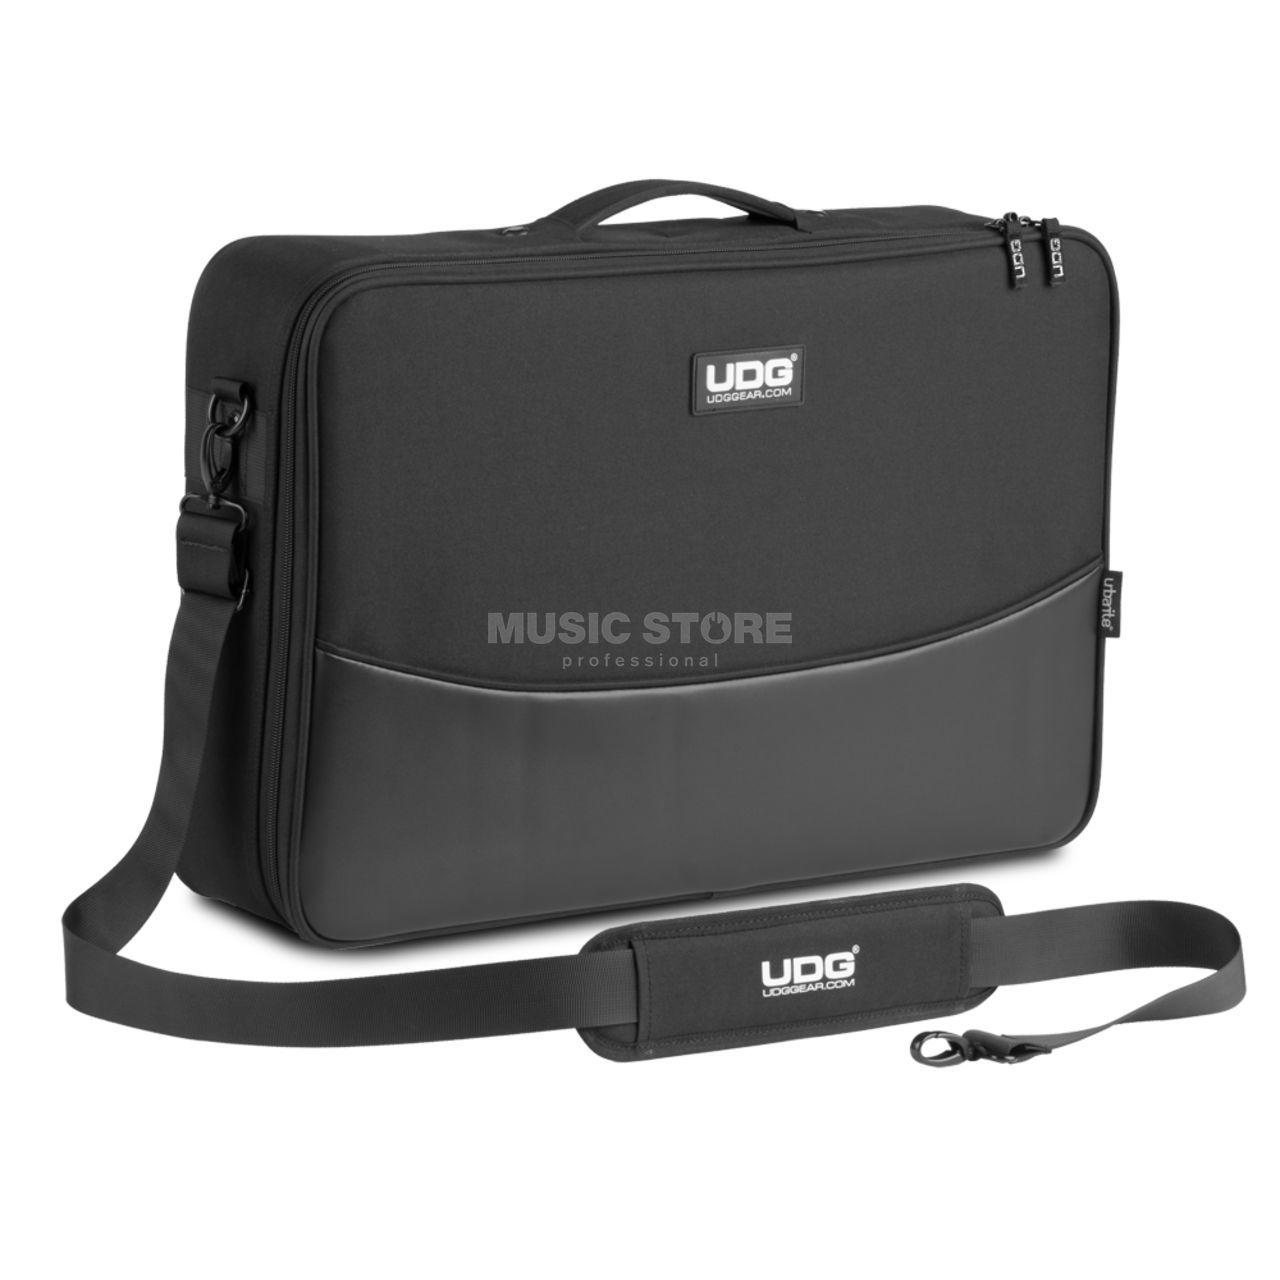 UDG Urbanite Controller Sleeve Medium Black (U7101BL) | MUSIC STORE professional | en US